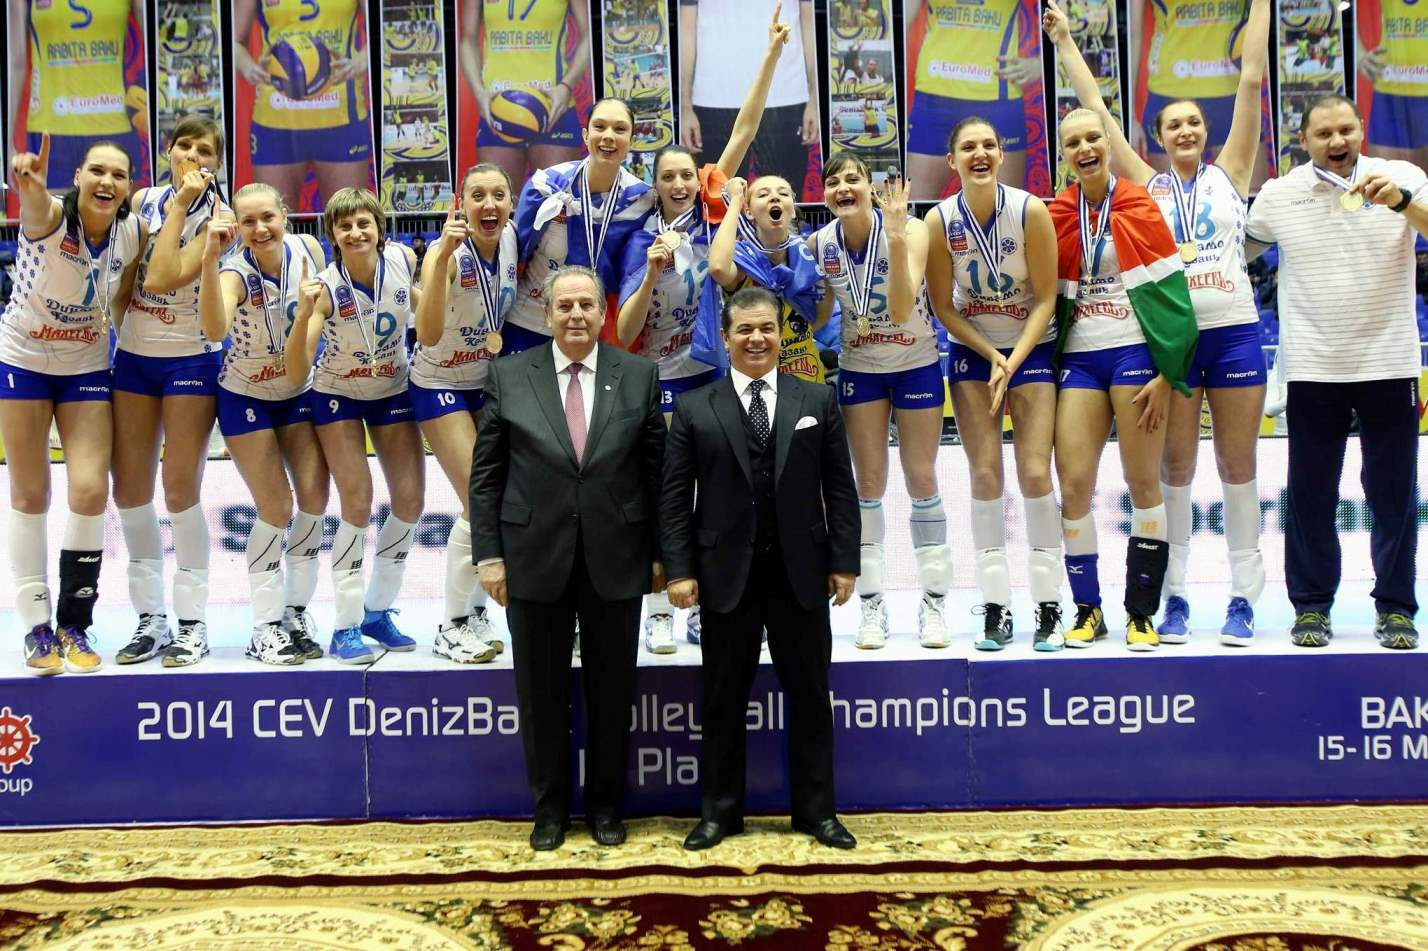 Cev Champions League Final 4 Mvp Ekaterina Gamova Volleywood